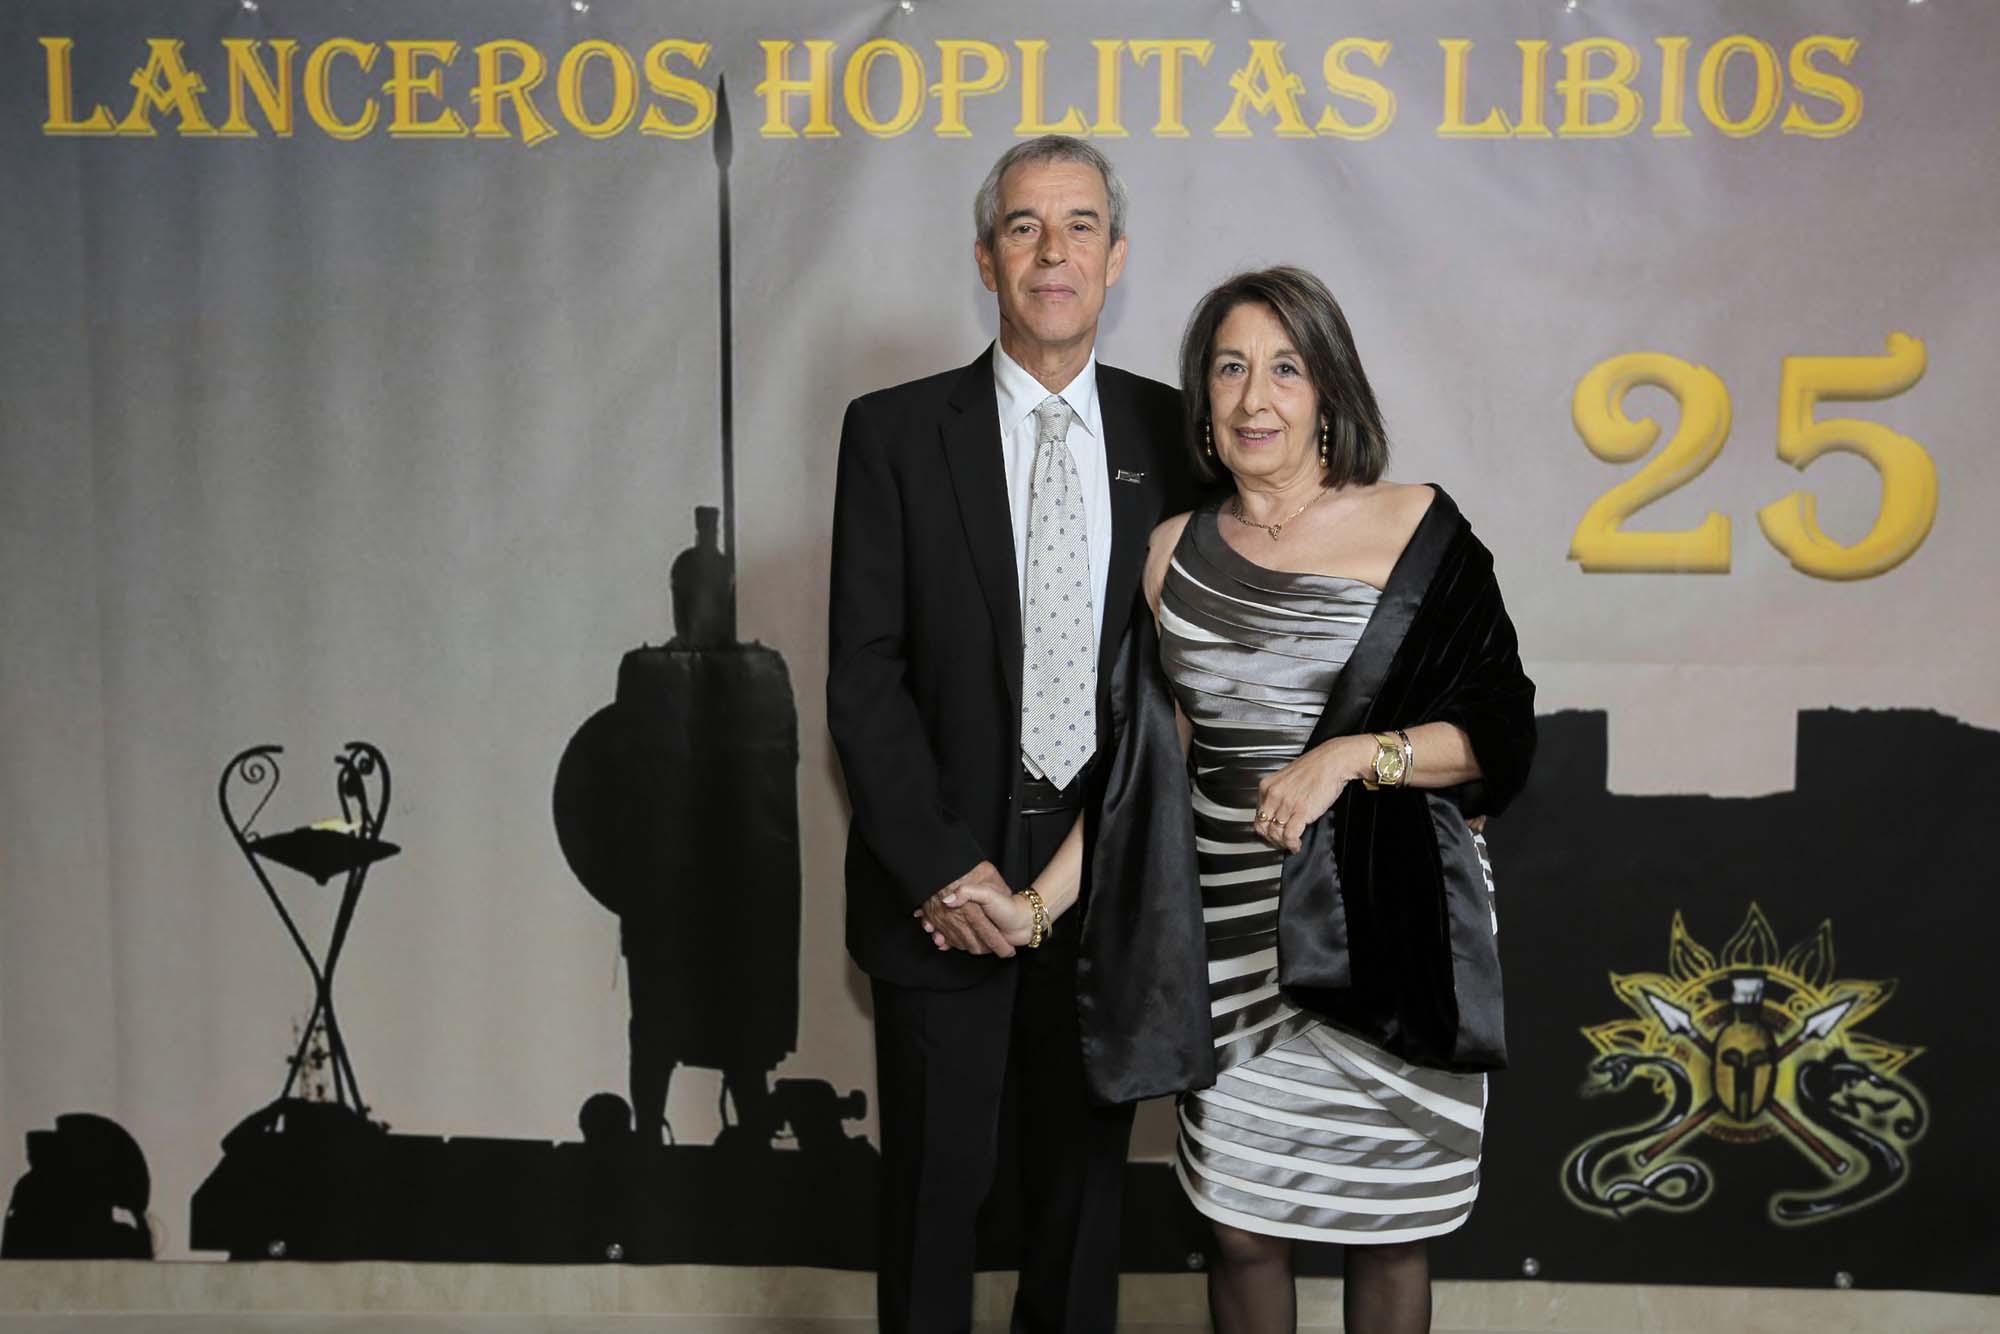 Lanceros Hoplitas Libios  (233)